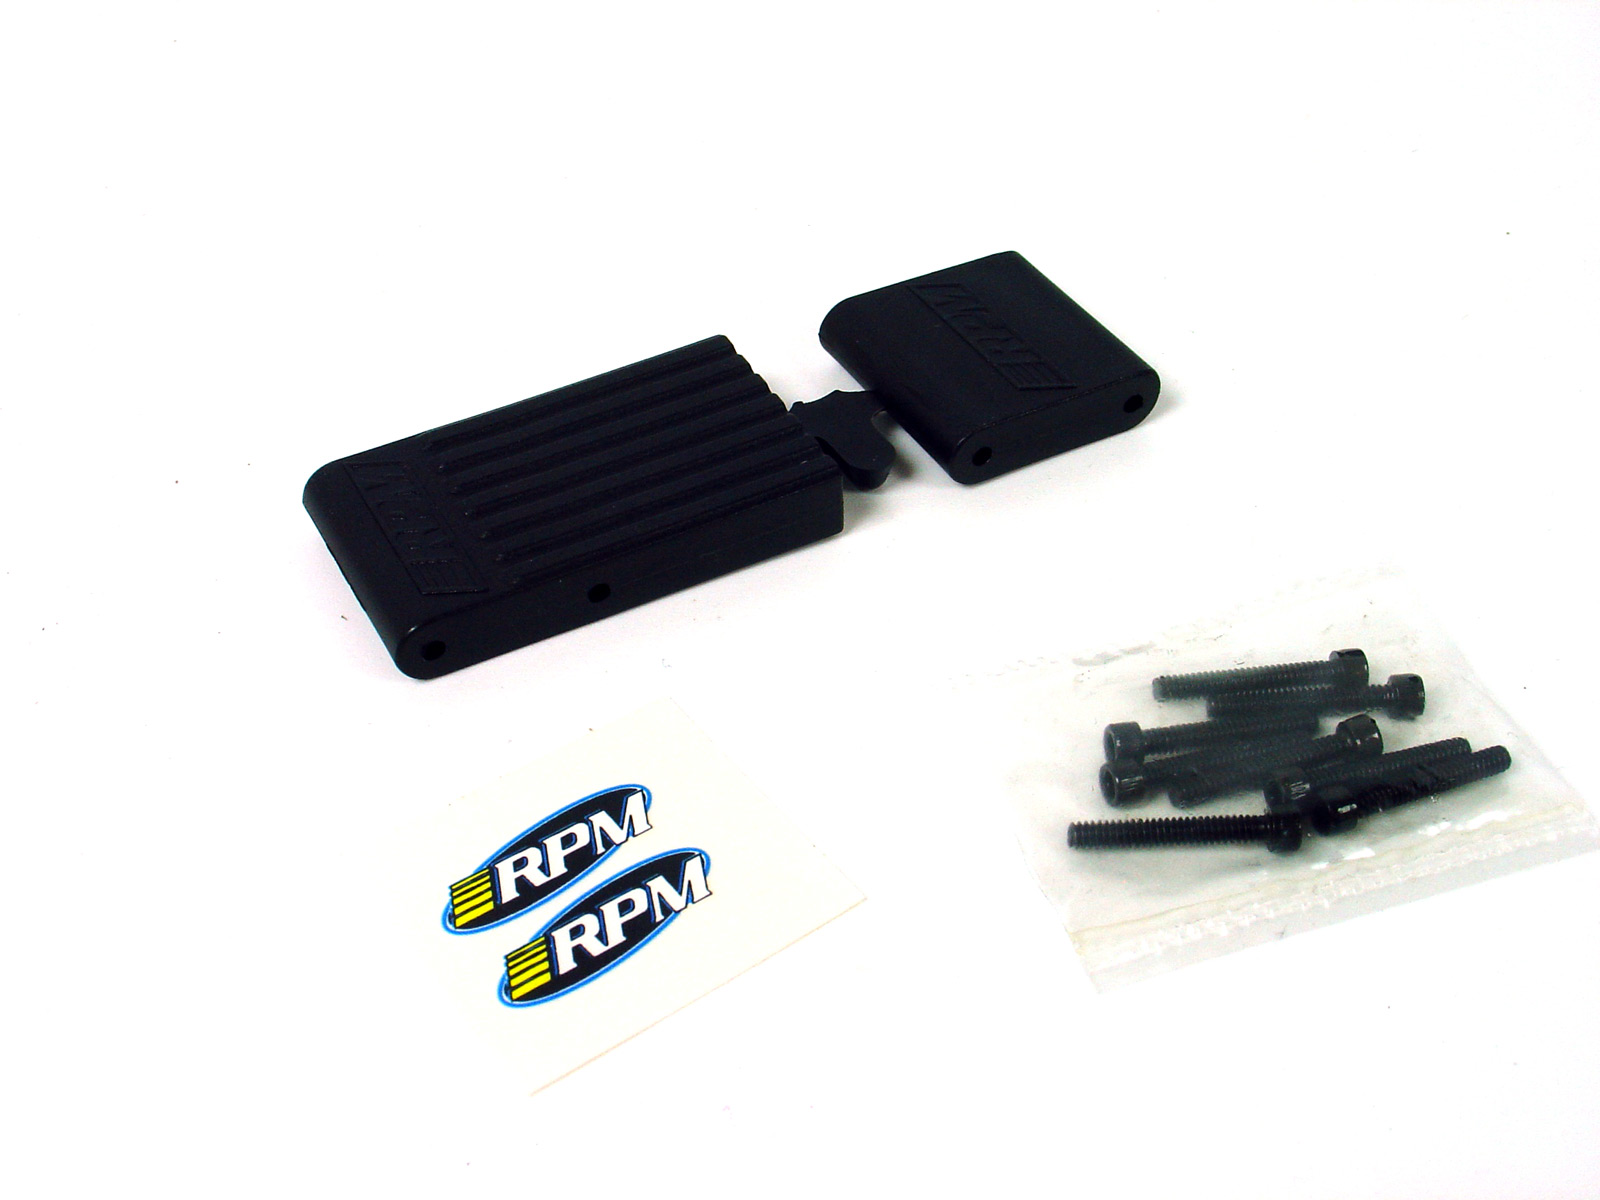 RPM Traxxas T-Maxx / E-Maxx Bulkhead Braces (Black) - RPM 80152